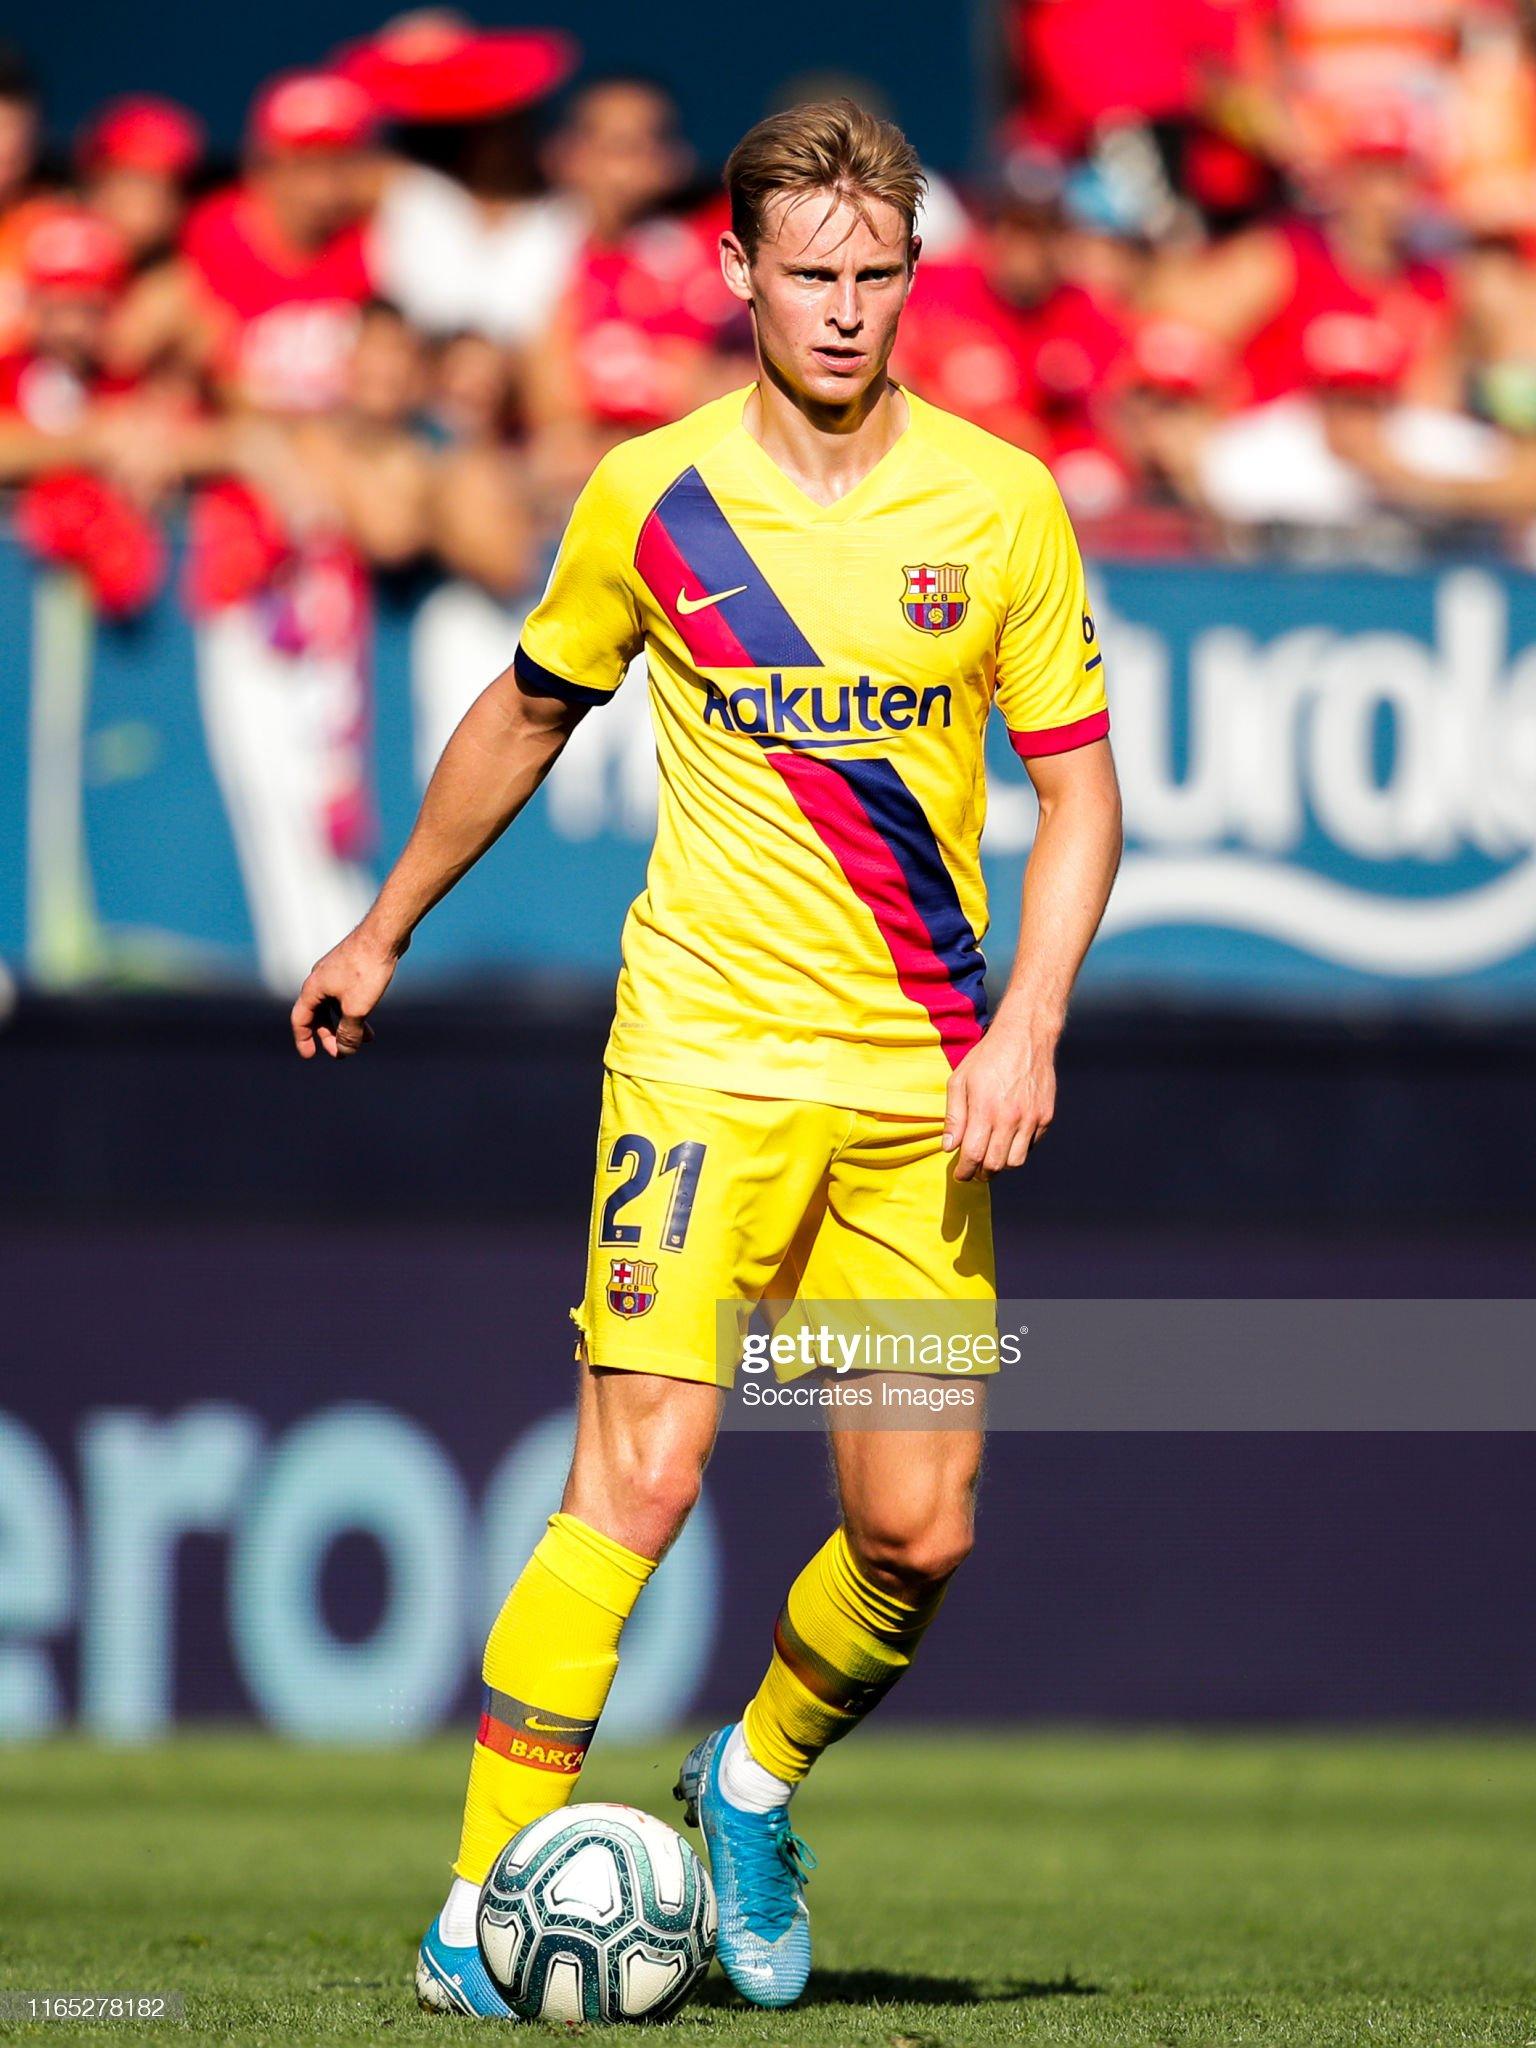 صور مباراة : أوساسونا - برشلونة 2-2 ( 31-08-2019 )  Frenkie-de-jong-of-fc-barcelona-during-the-la-liga-santander-match-picture-id1165278182?s=2048x2048